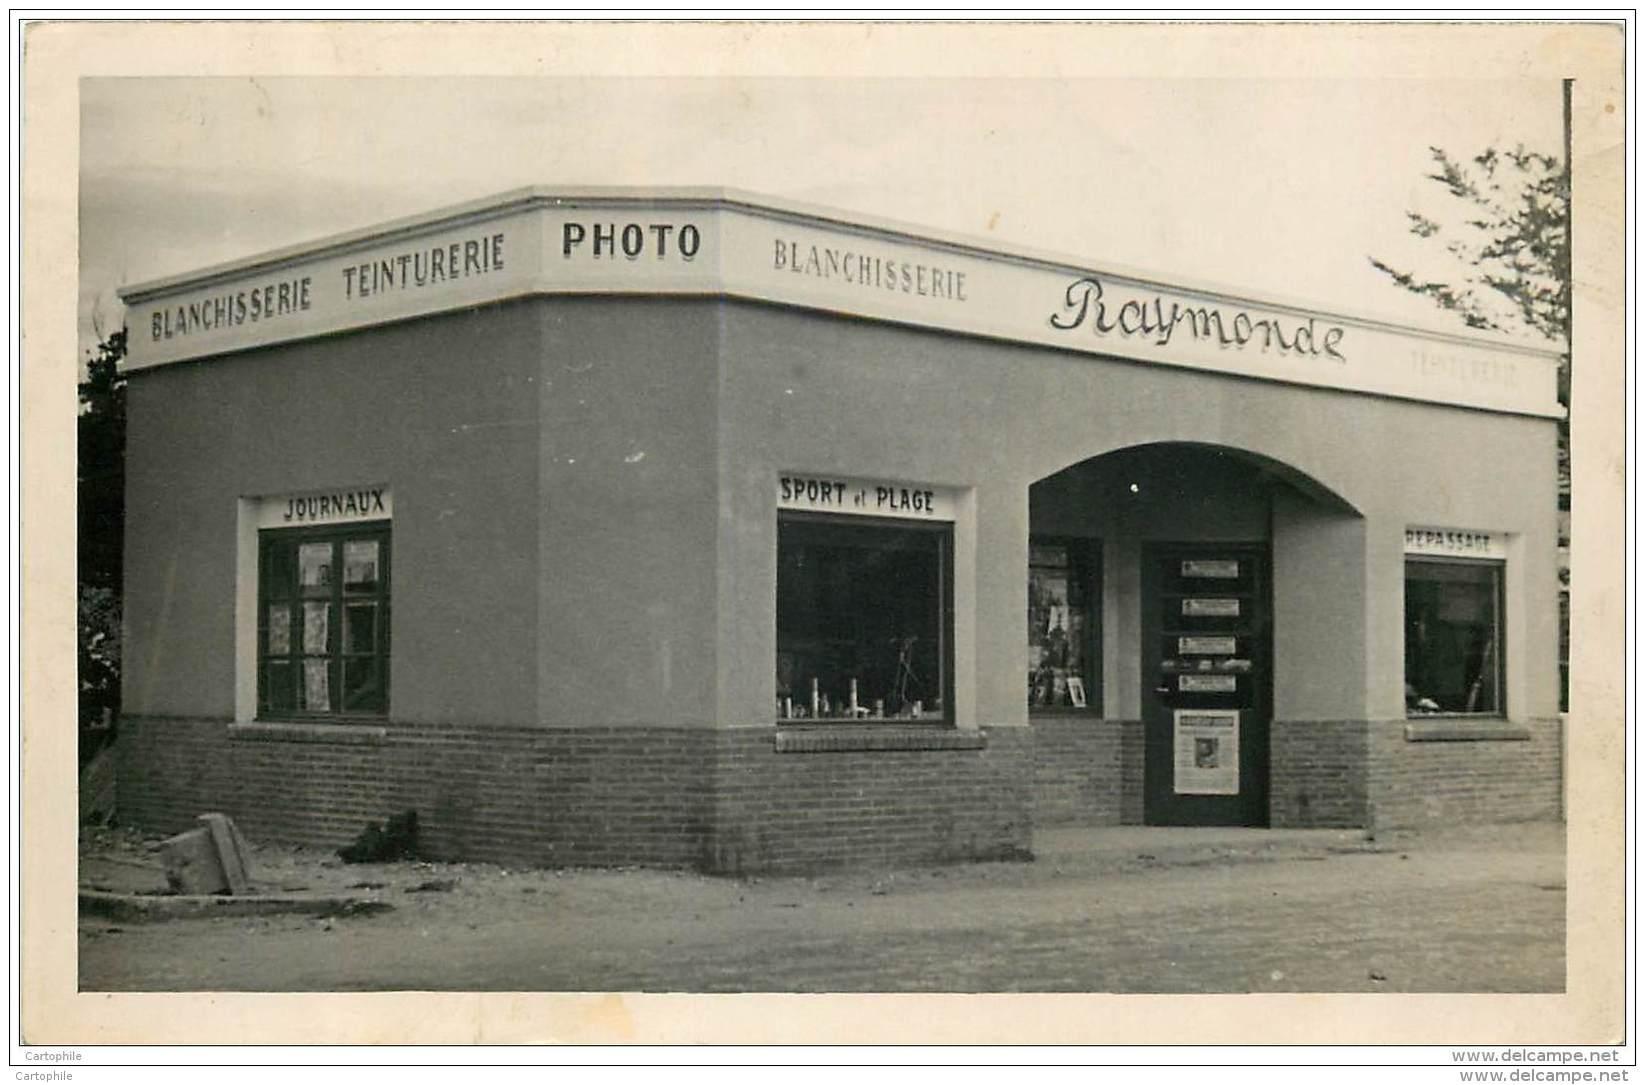 Carte Photo De La Blanchisserie Raymonde - Teinturerie Photo - Vari